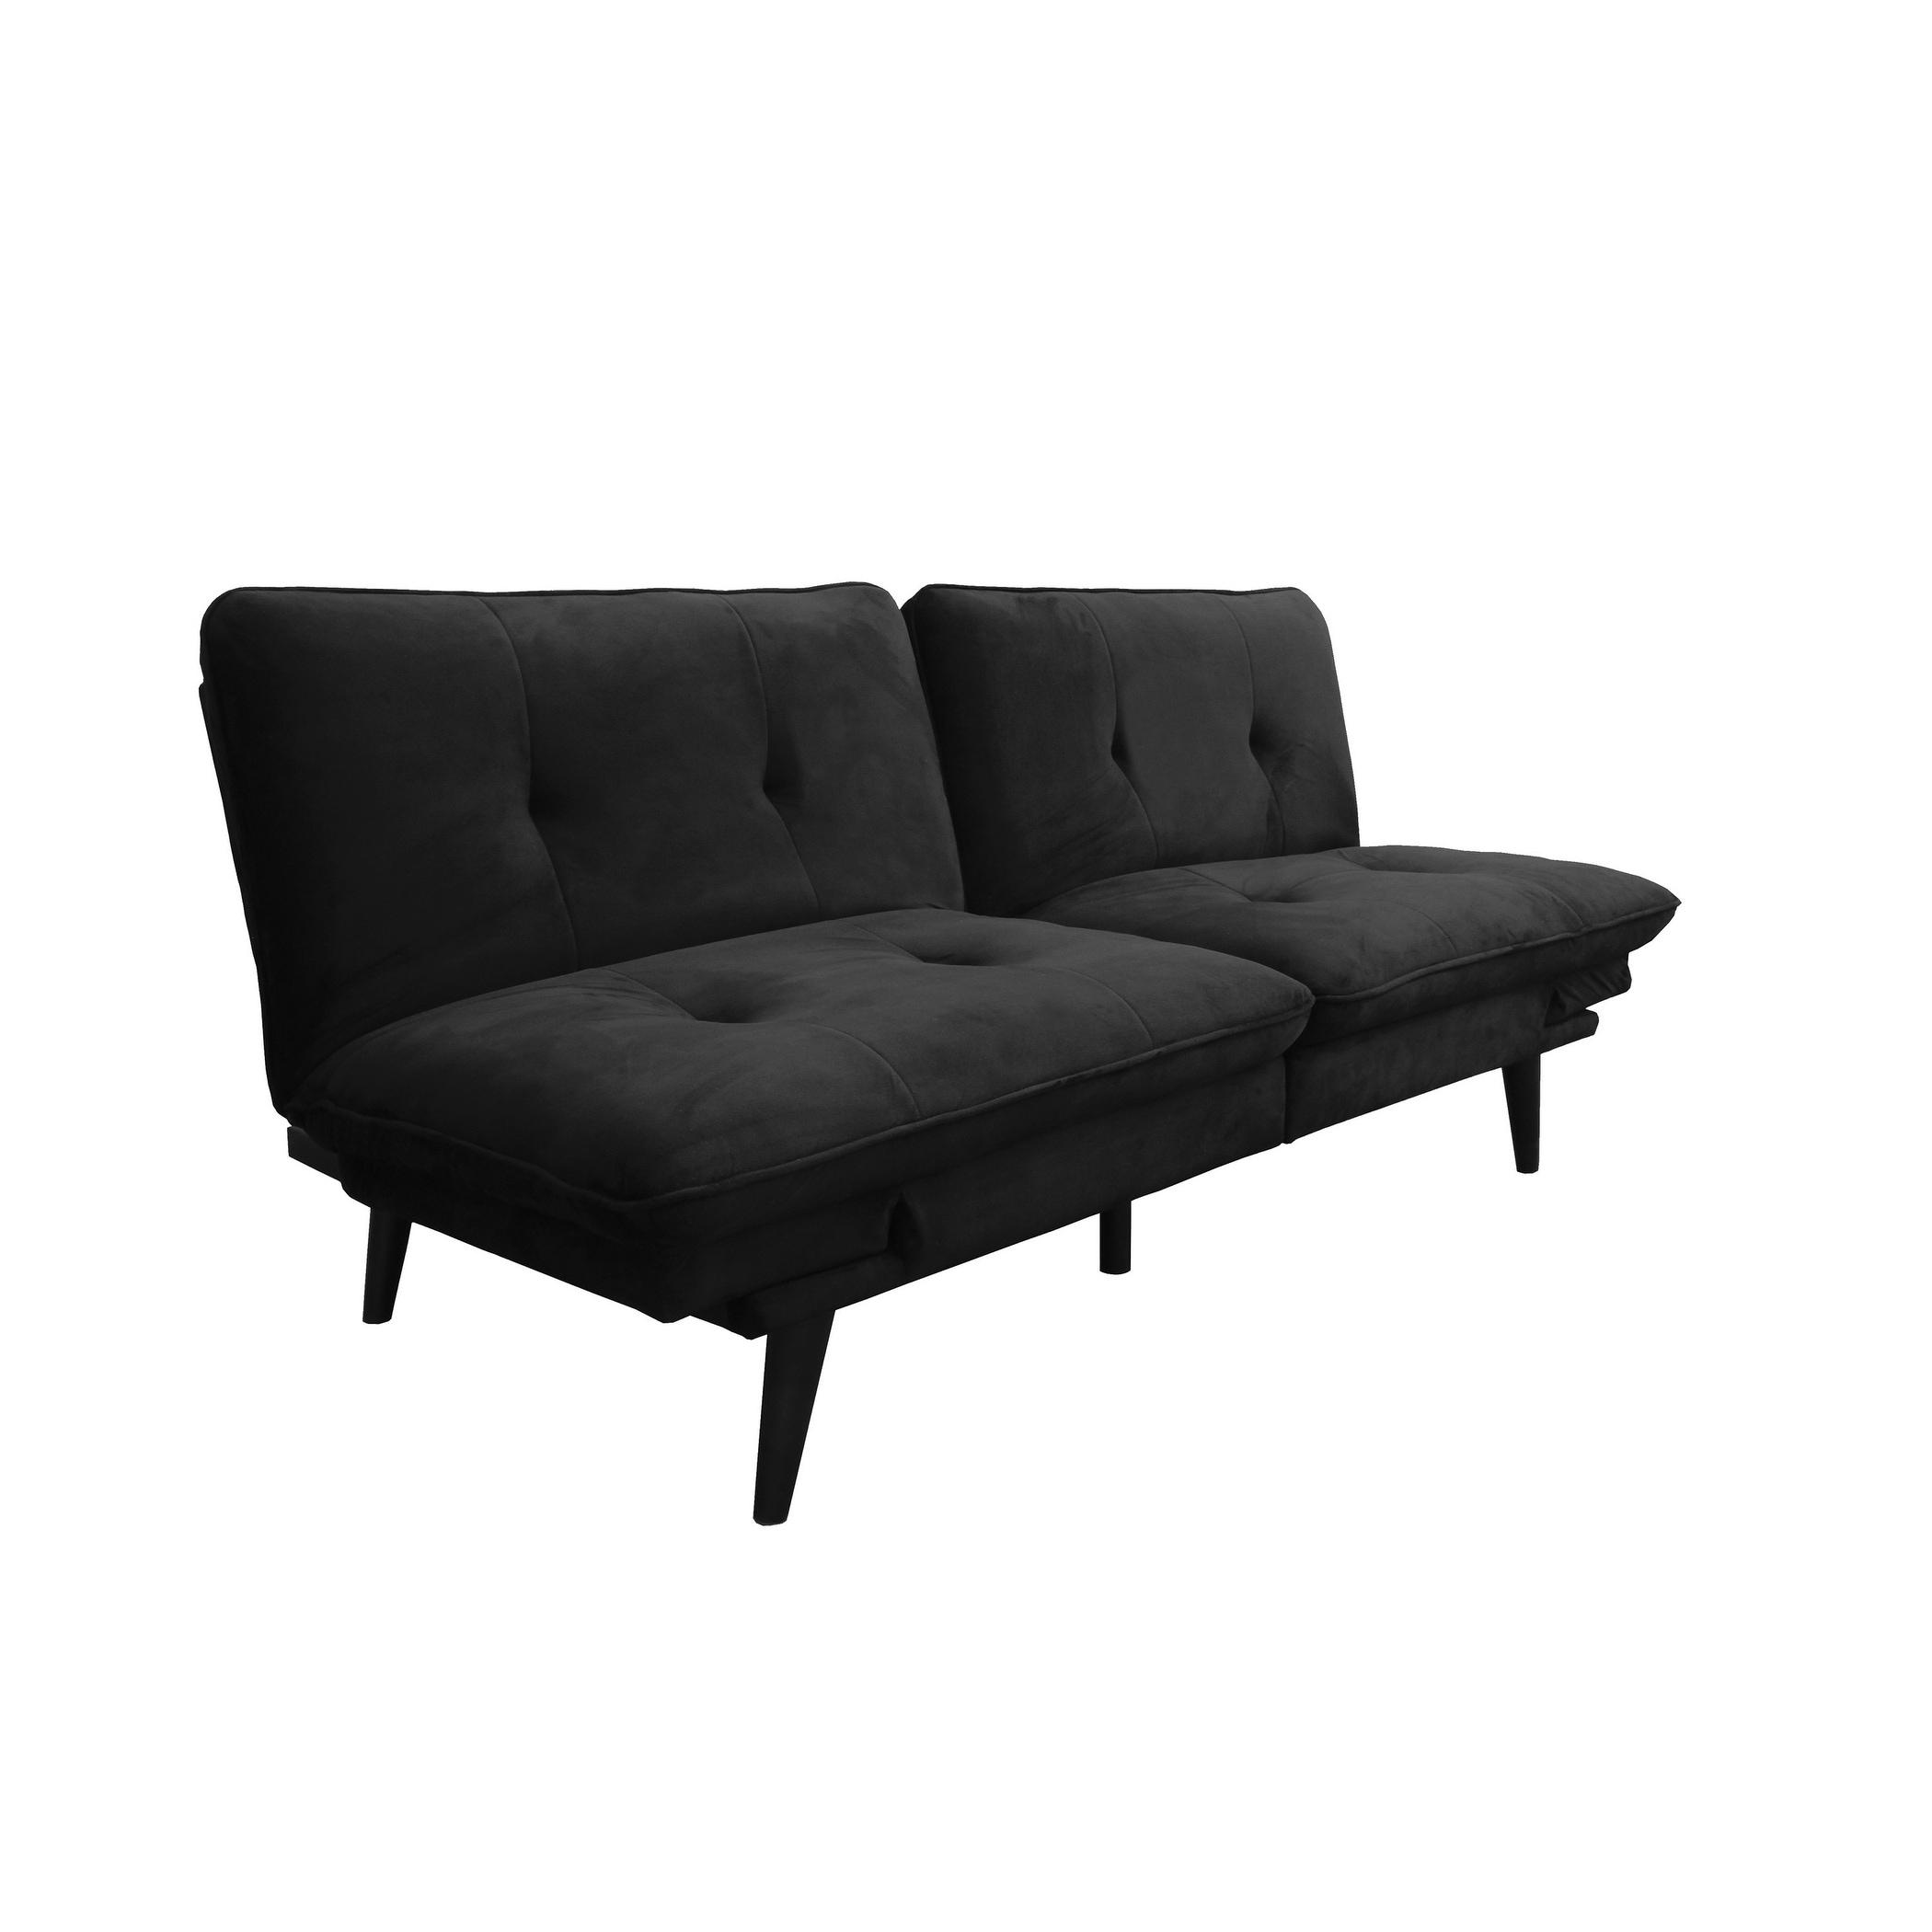 Serta Florence Convertible Sofa Free Shipping Today Com 25730351